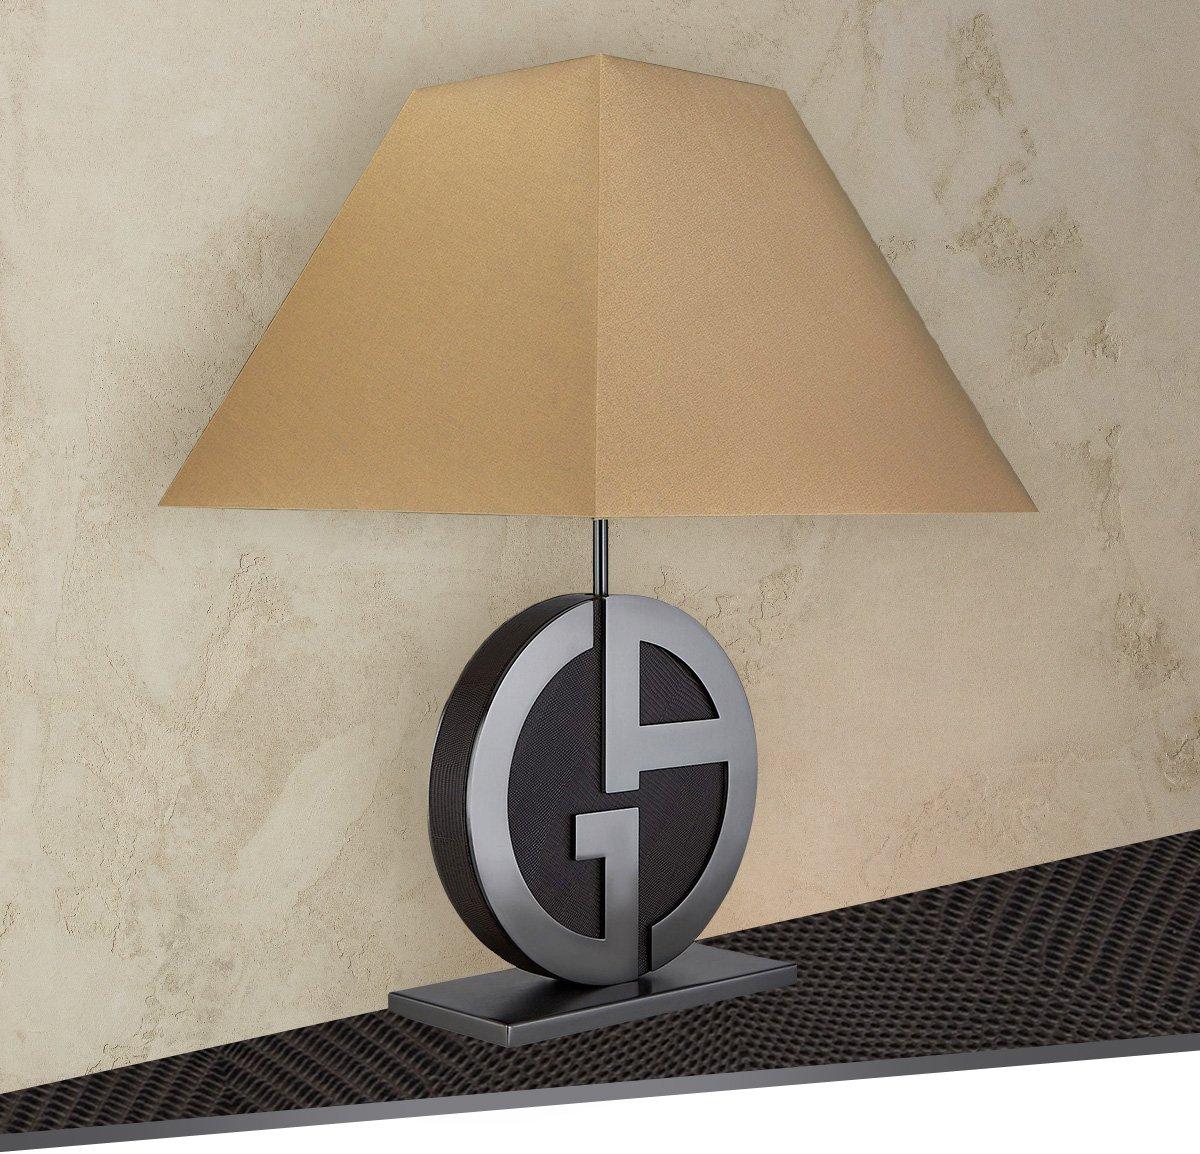 neues wie man kauft Rabatt Armani: The iconic Armani/Casa lamp | Milled